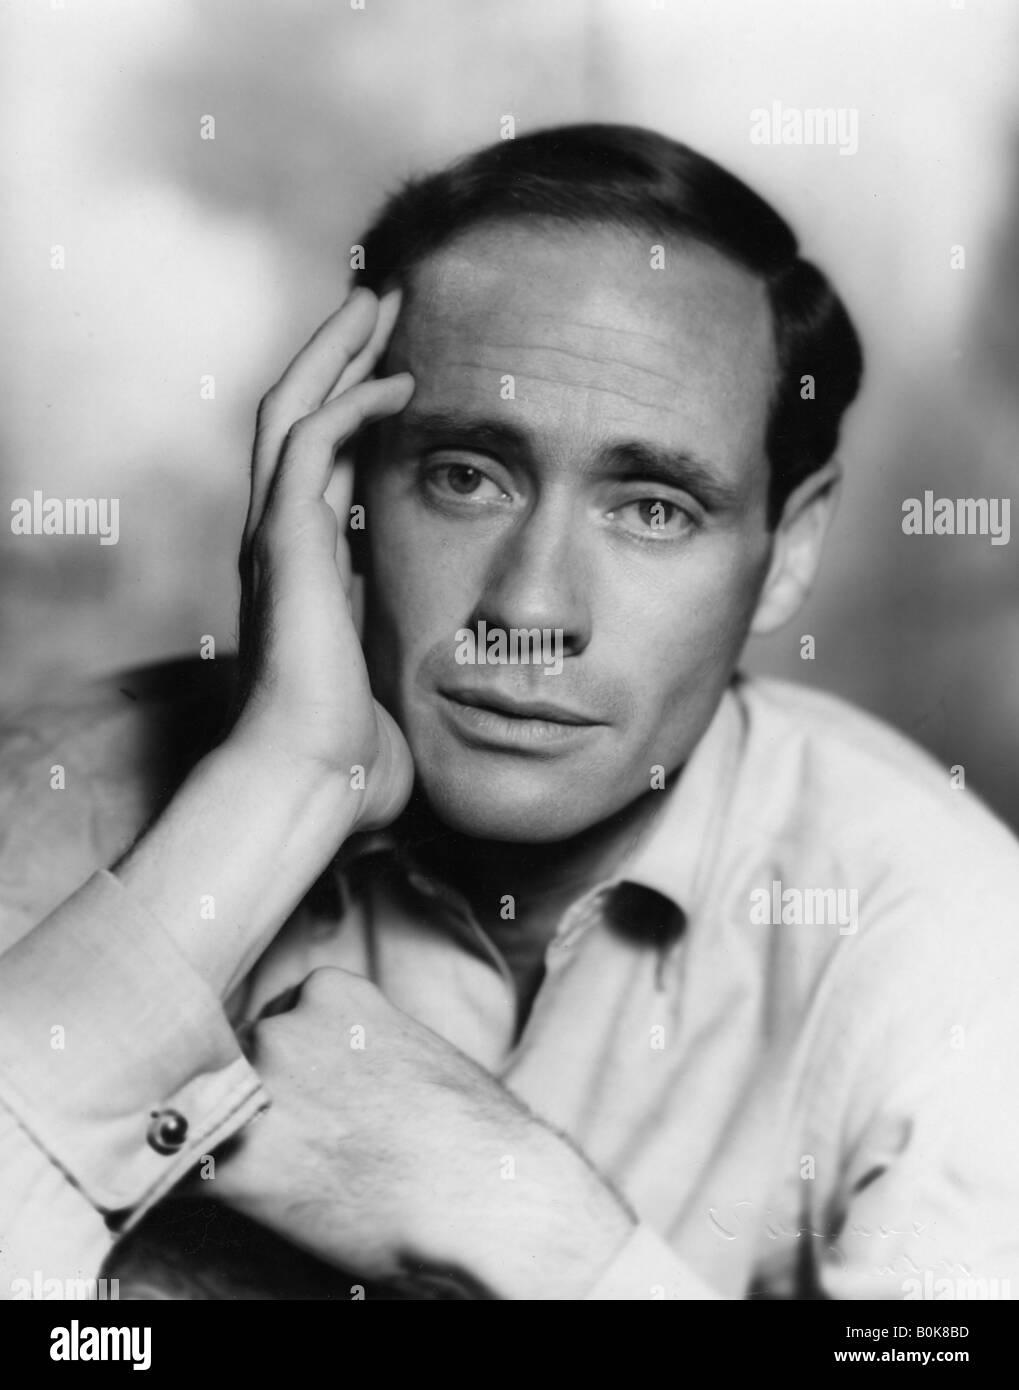 Mel Ferrer (b1917), Cuban-American film actor, producer and director, 1950s. Artist: Vivienne Sharp - Stock Image